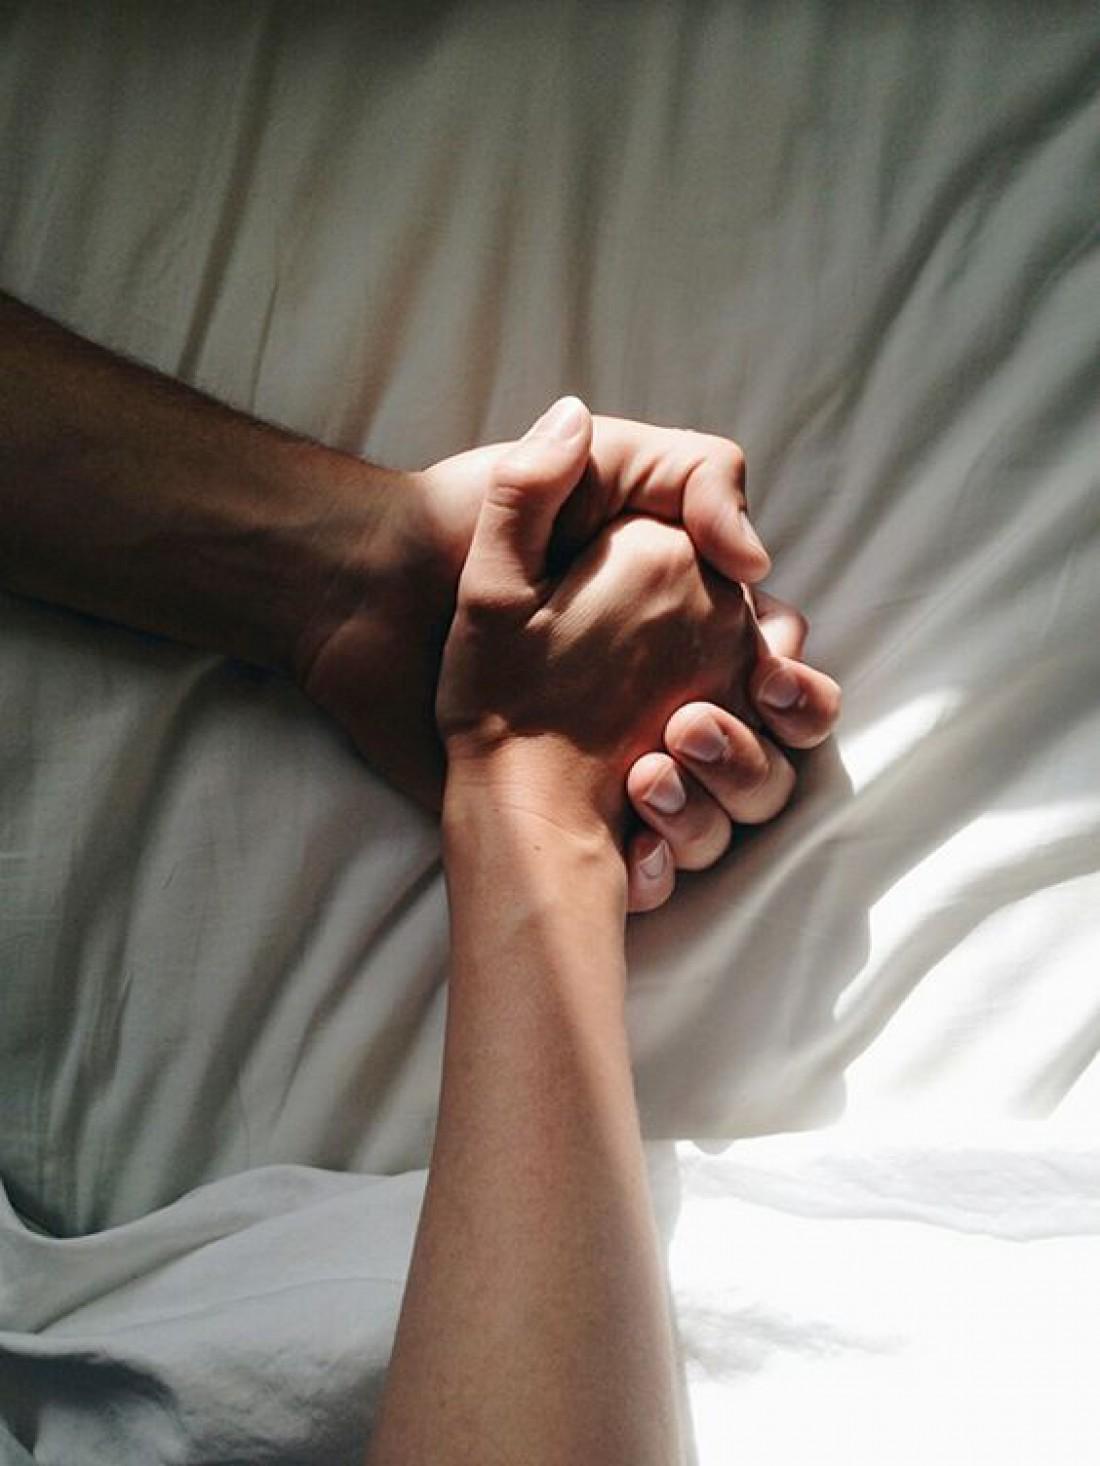 Мужчина испытал оргазм в сексе